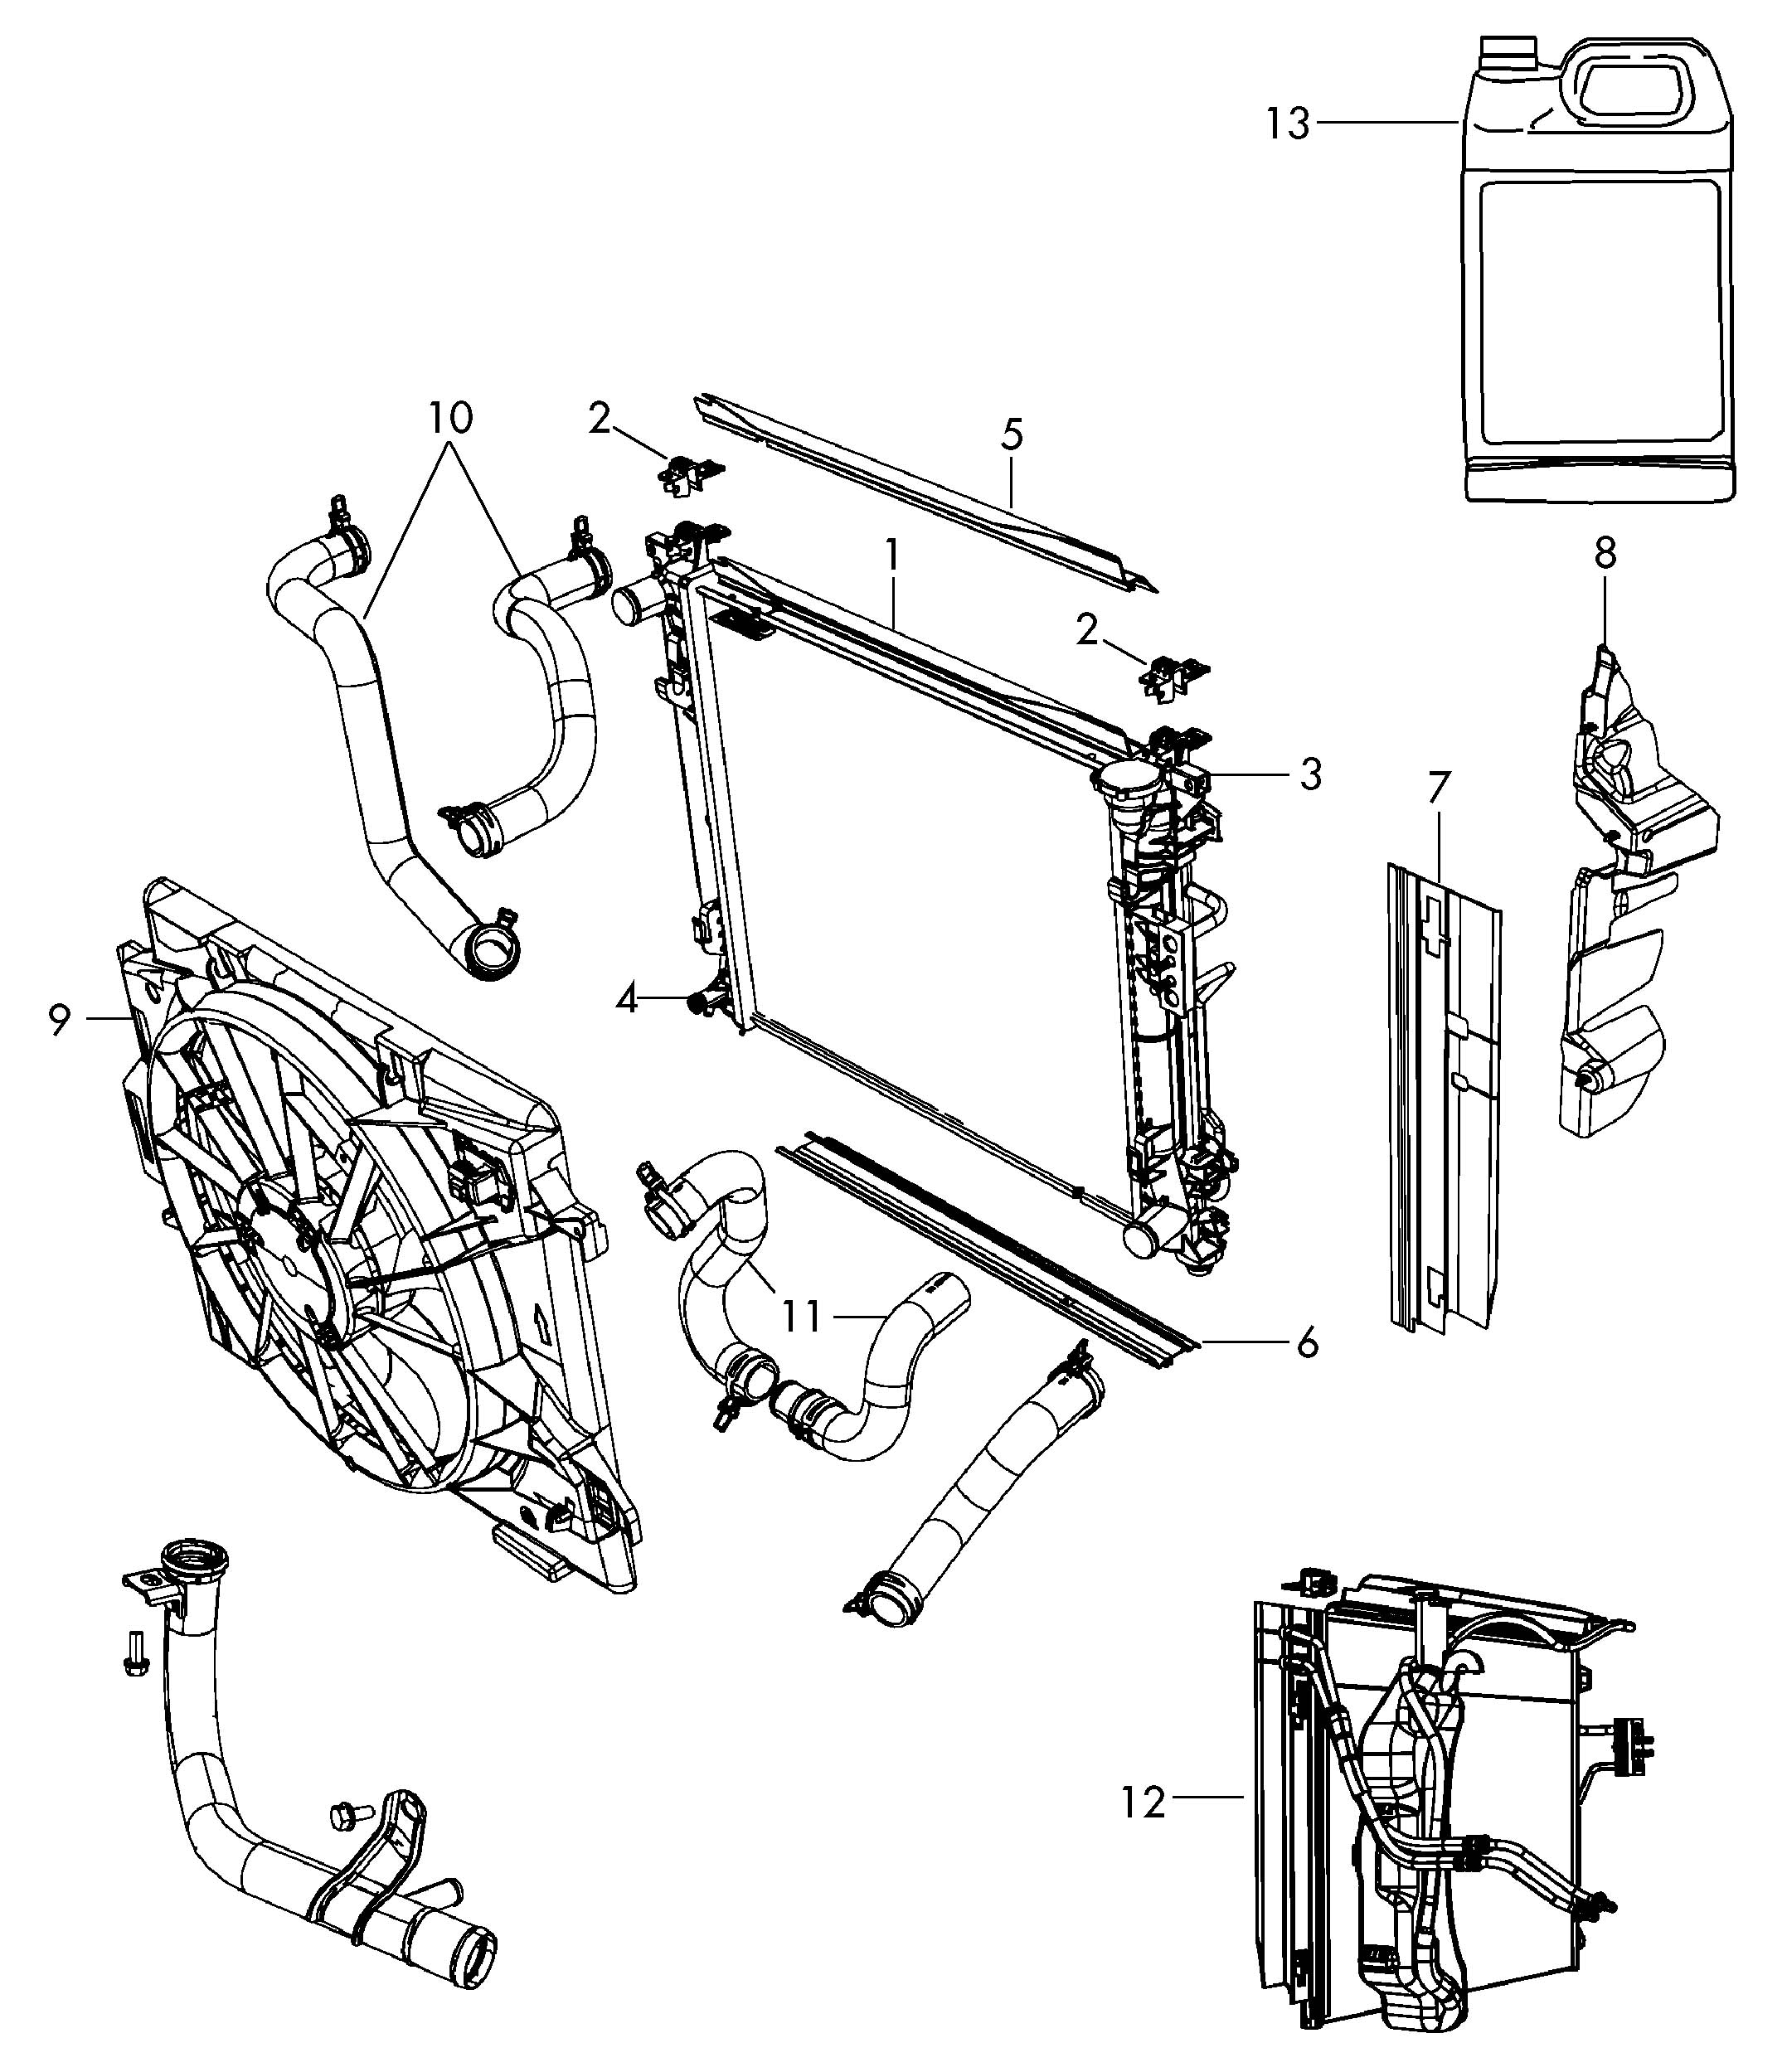 Mazda B Distributor Wiring Diagram Mazda Auto Wiring